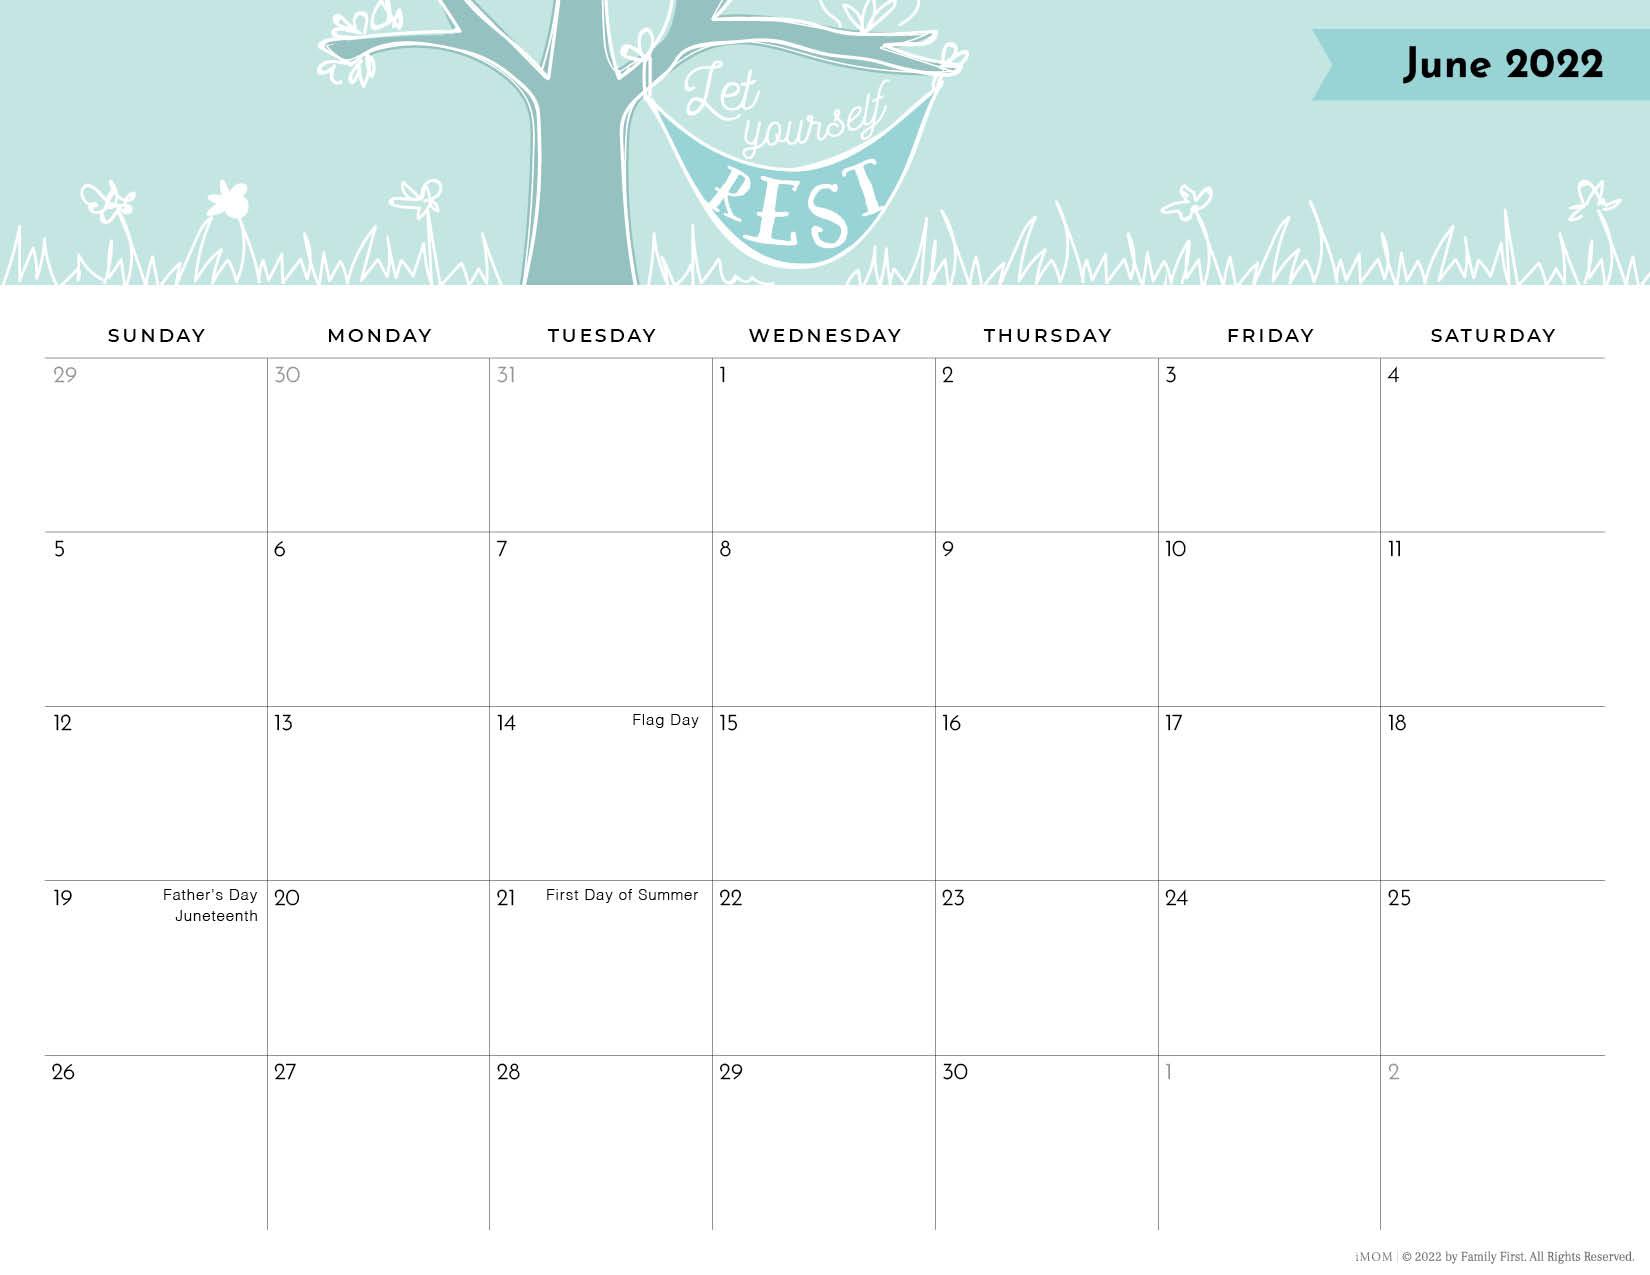 2022 June positive thoughts printable calendar